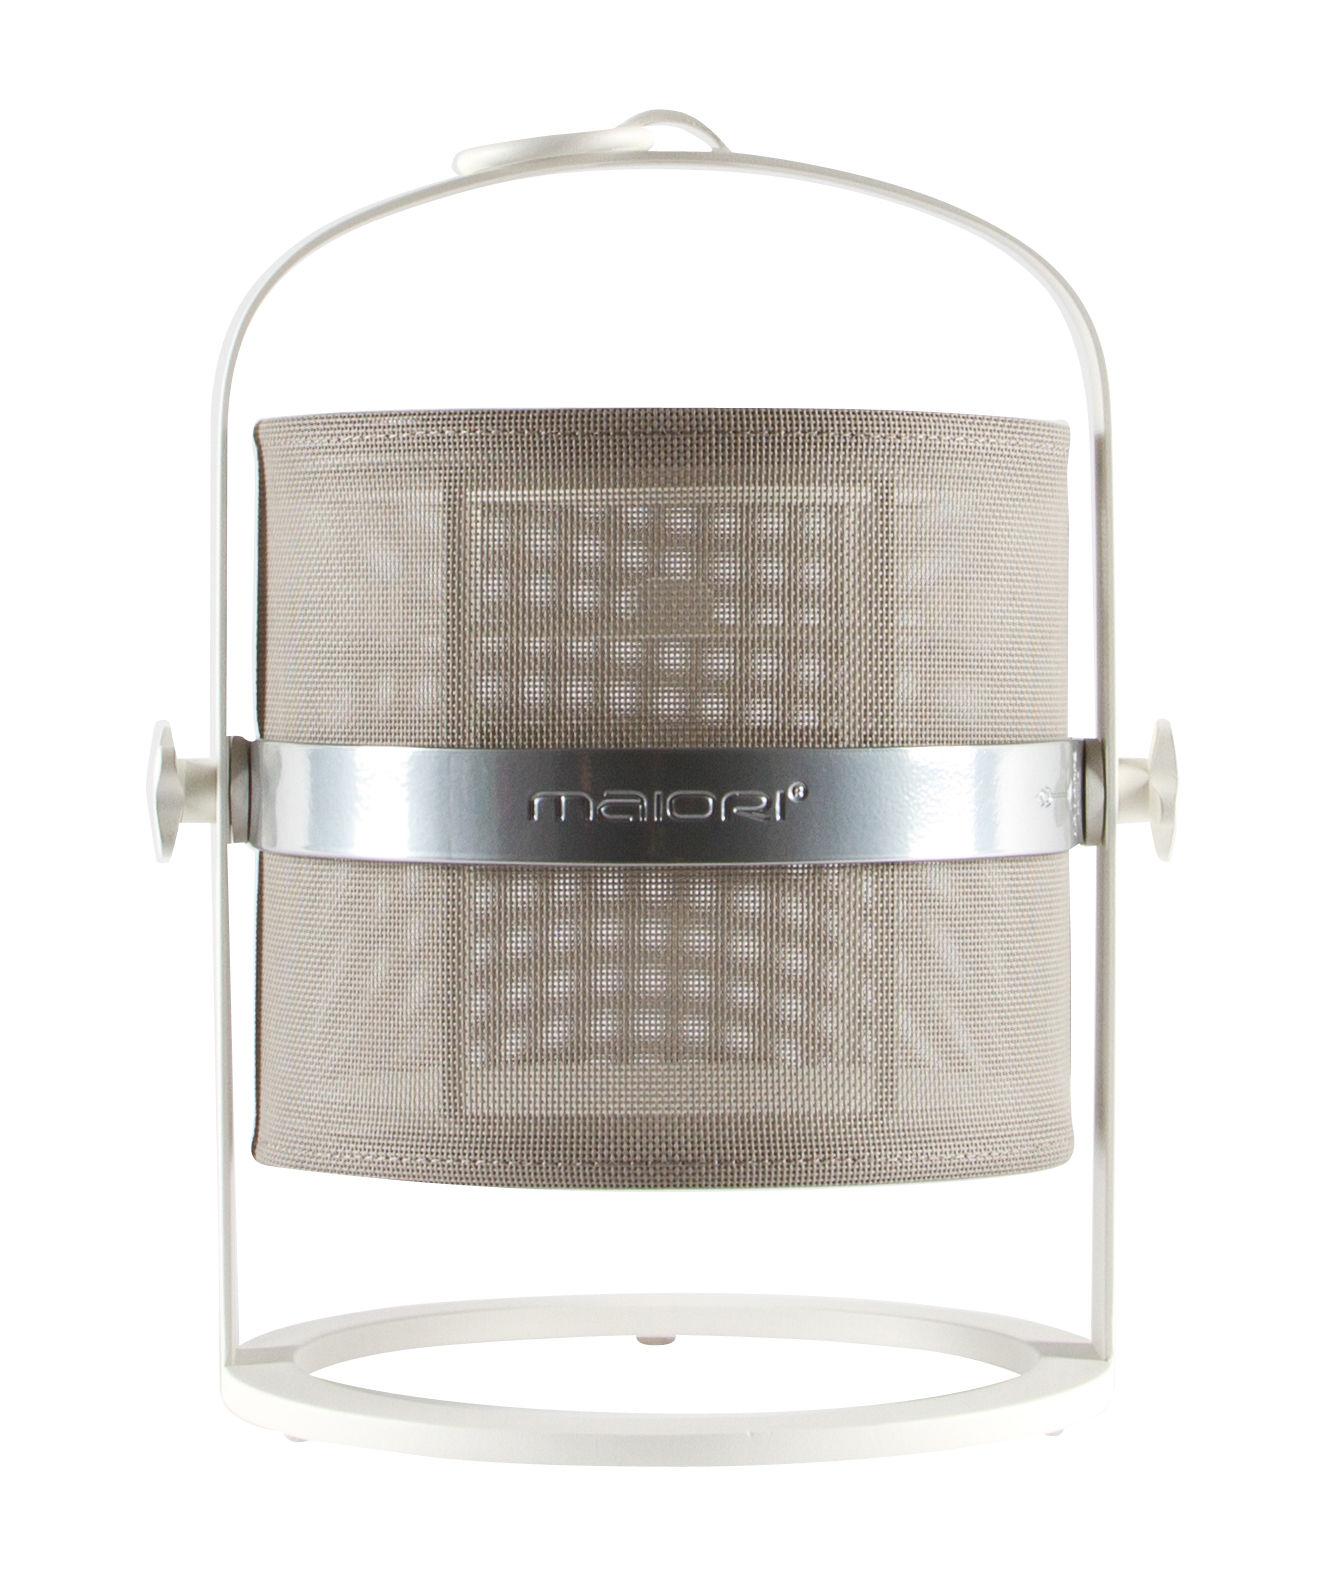 solarlampe la lampe petite led von maiori wei grau. Black Bedroom Furniture Sets. Home Design Ideas